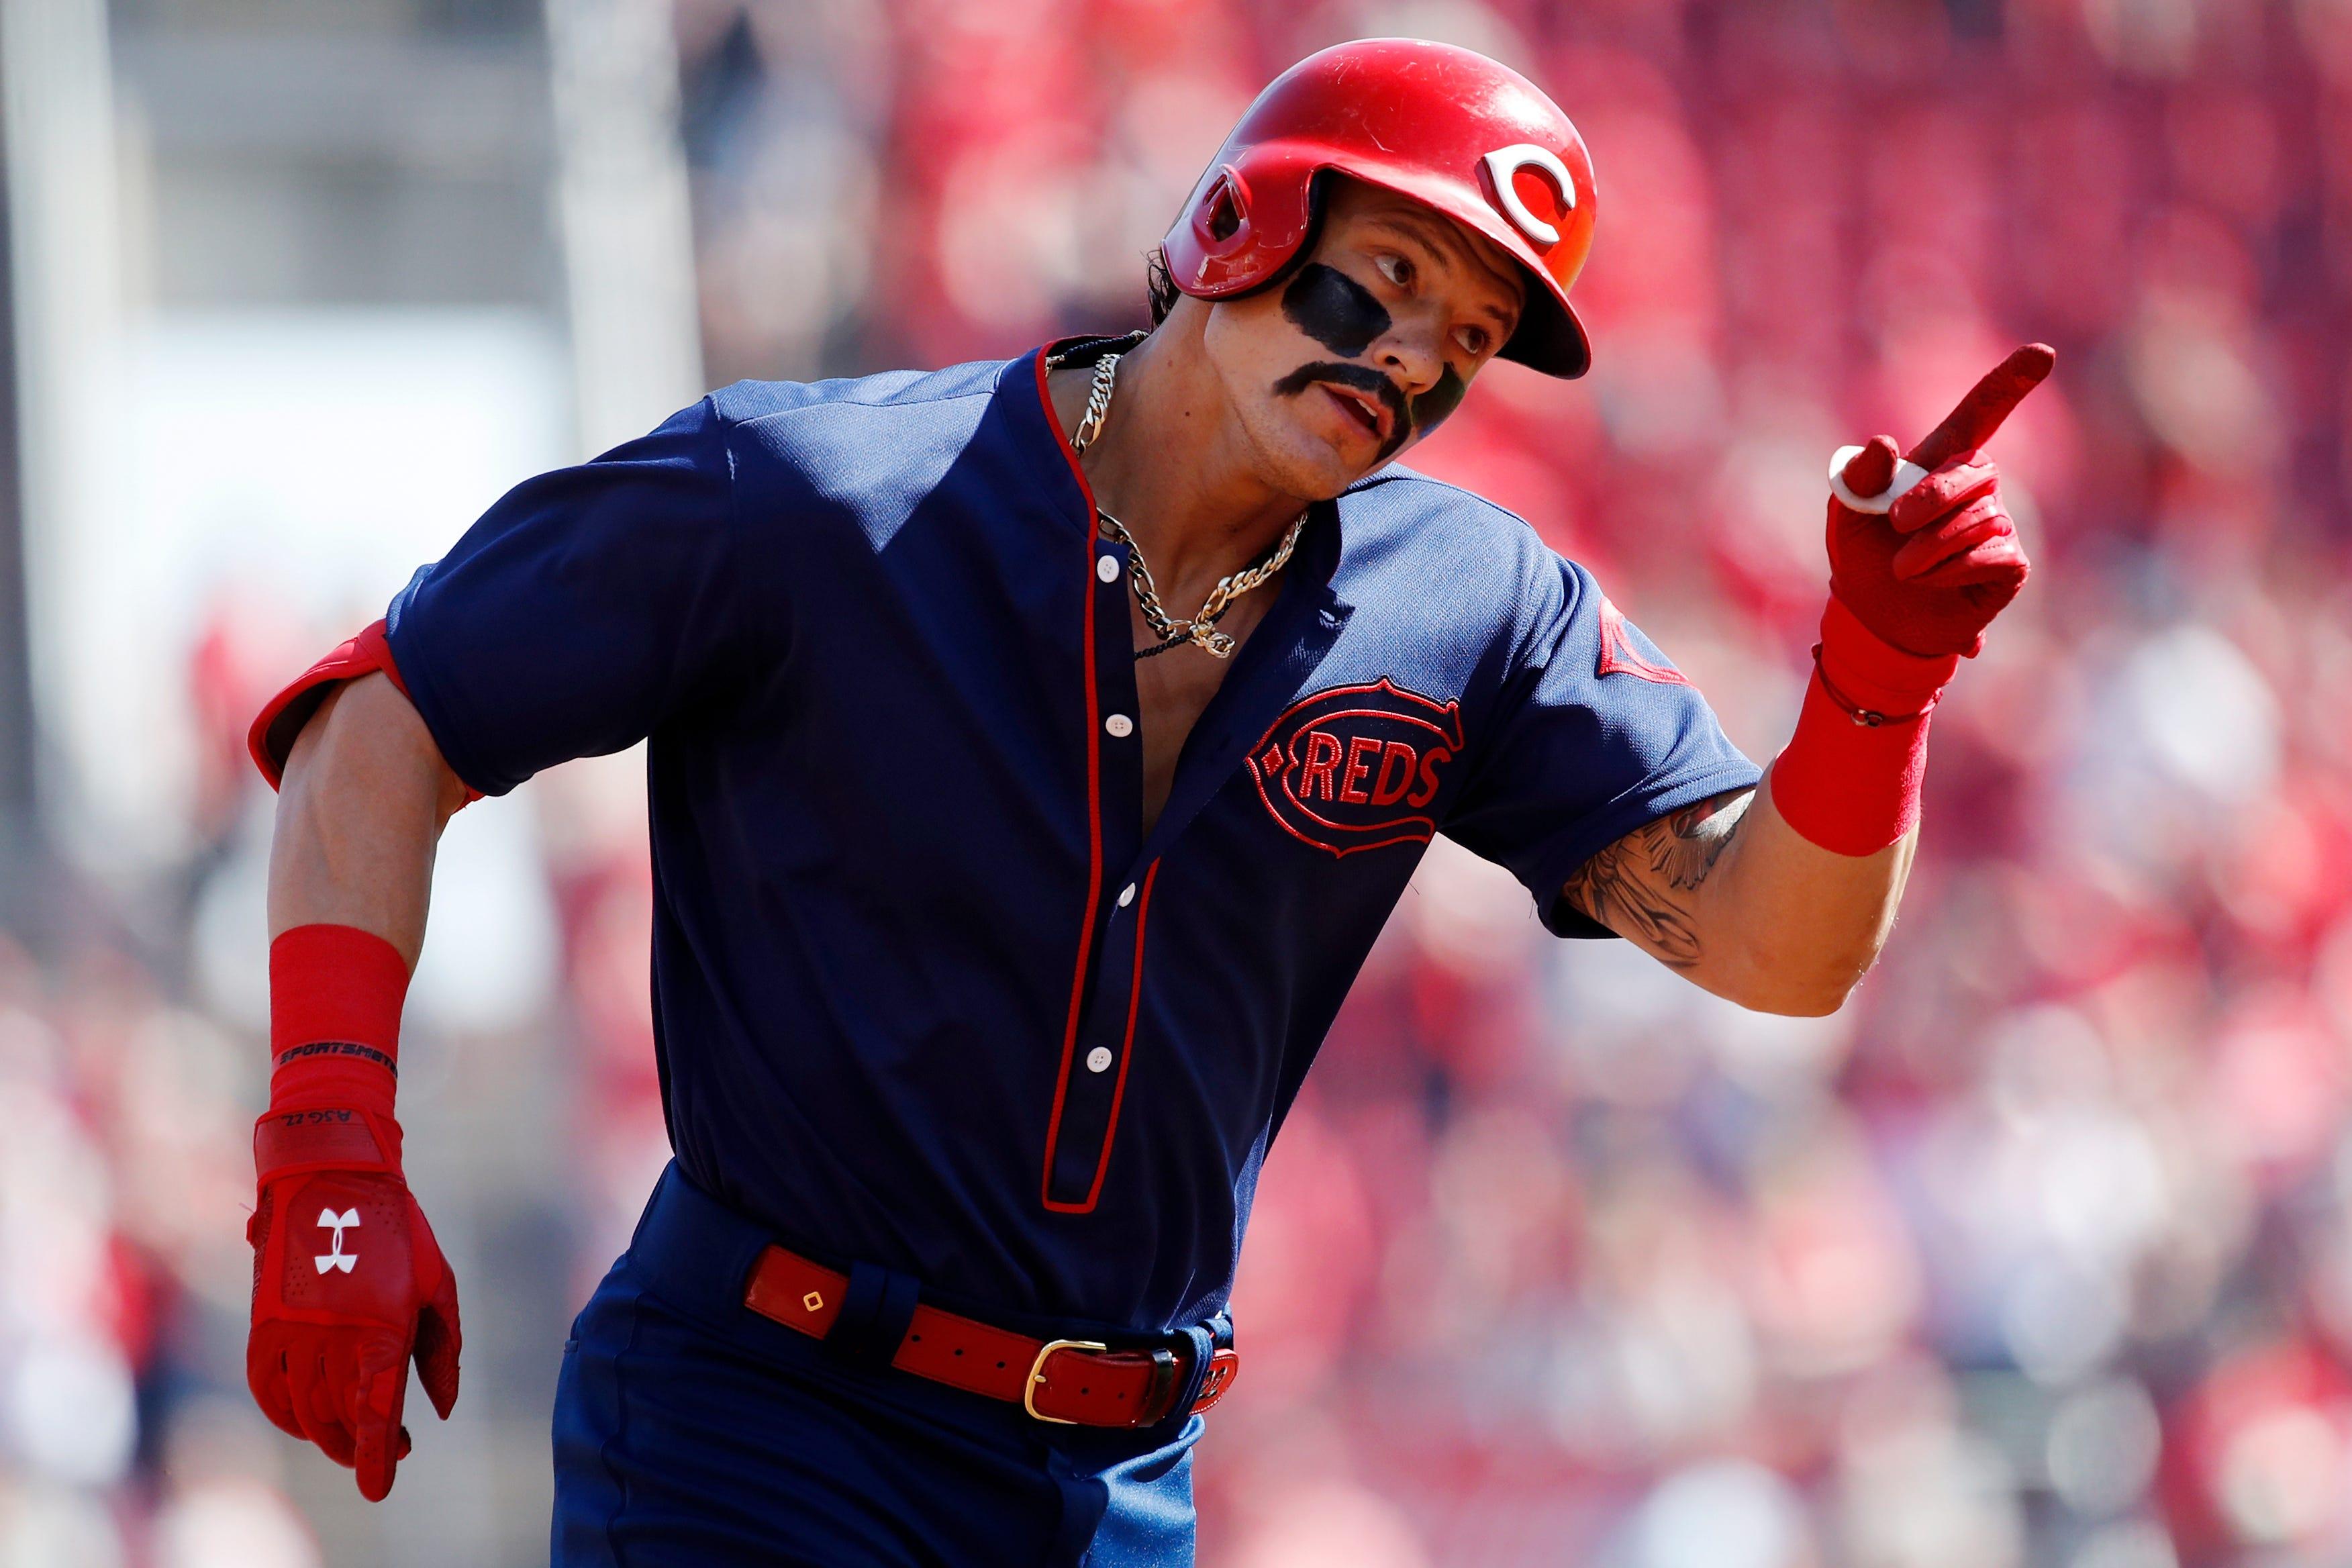 Fanartikel Mlb Baseball T-shirt Cincinnati Reds Joey Votto 19 Shades-victory Weitere Ballsportarten